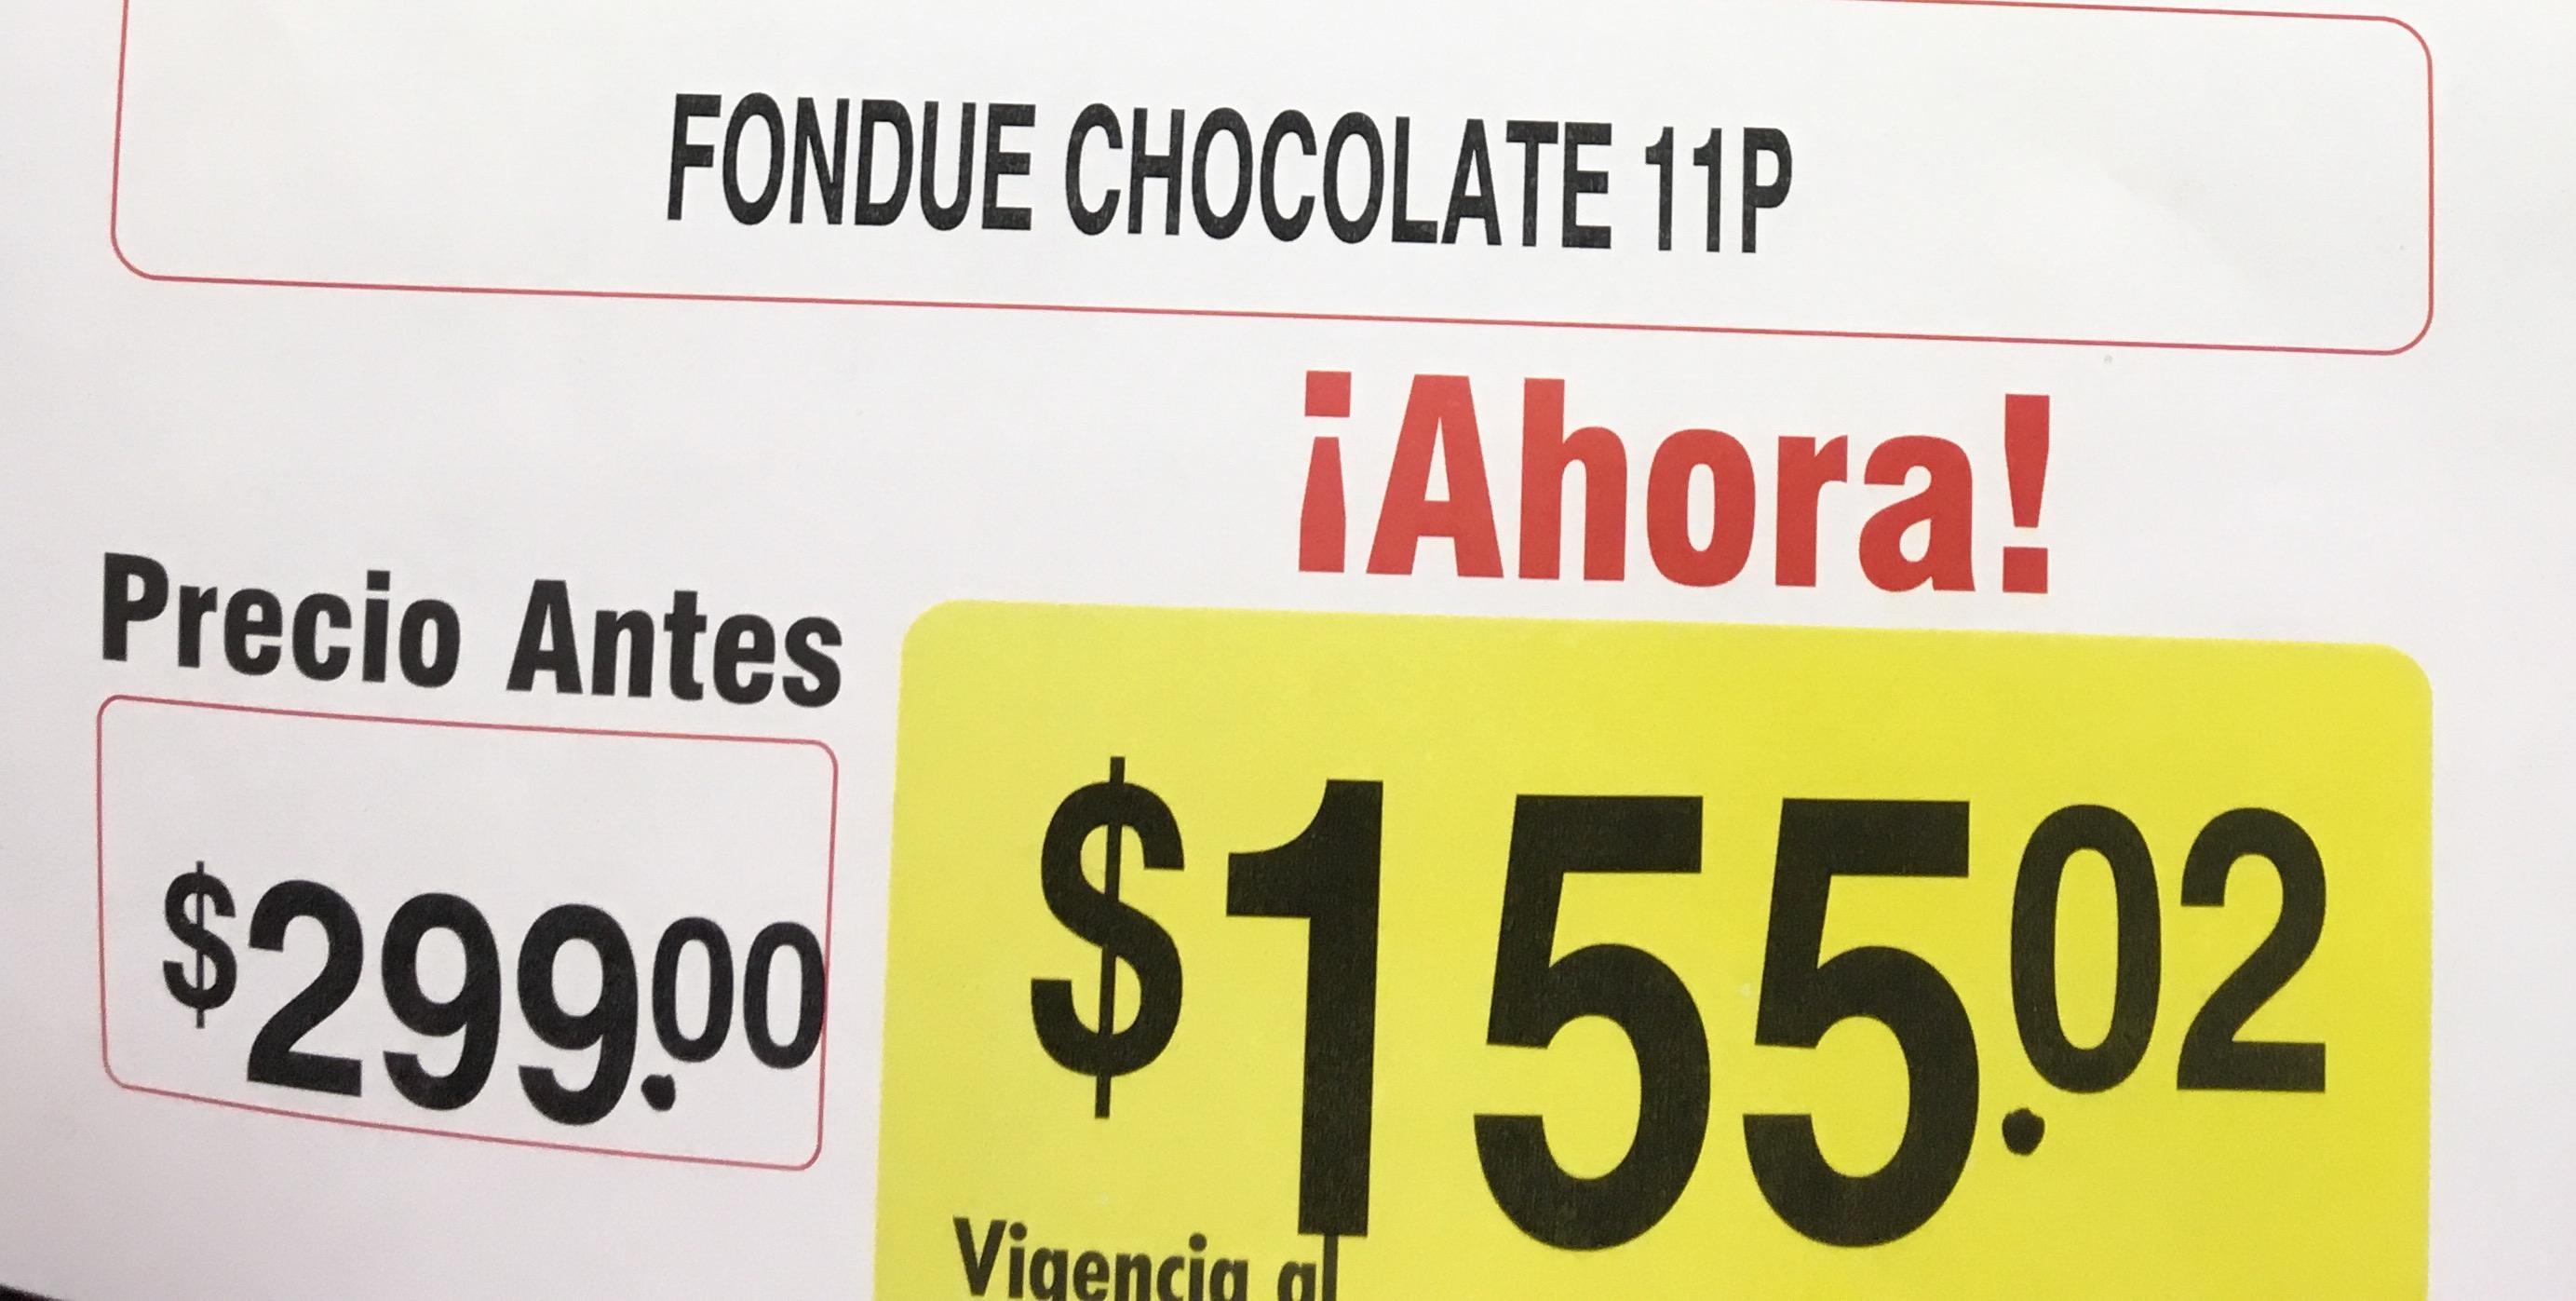 Superama Av Emiliano Zapata - Set fondue de chocolate